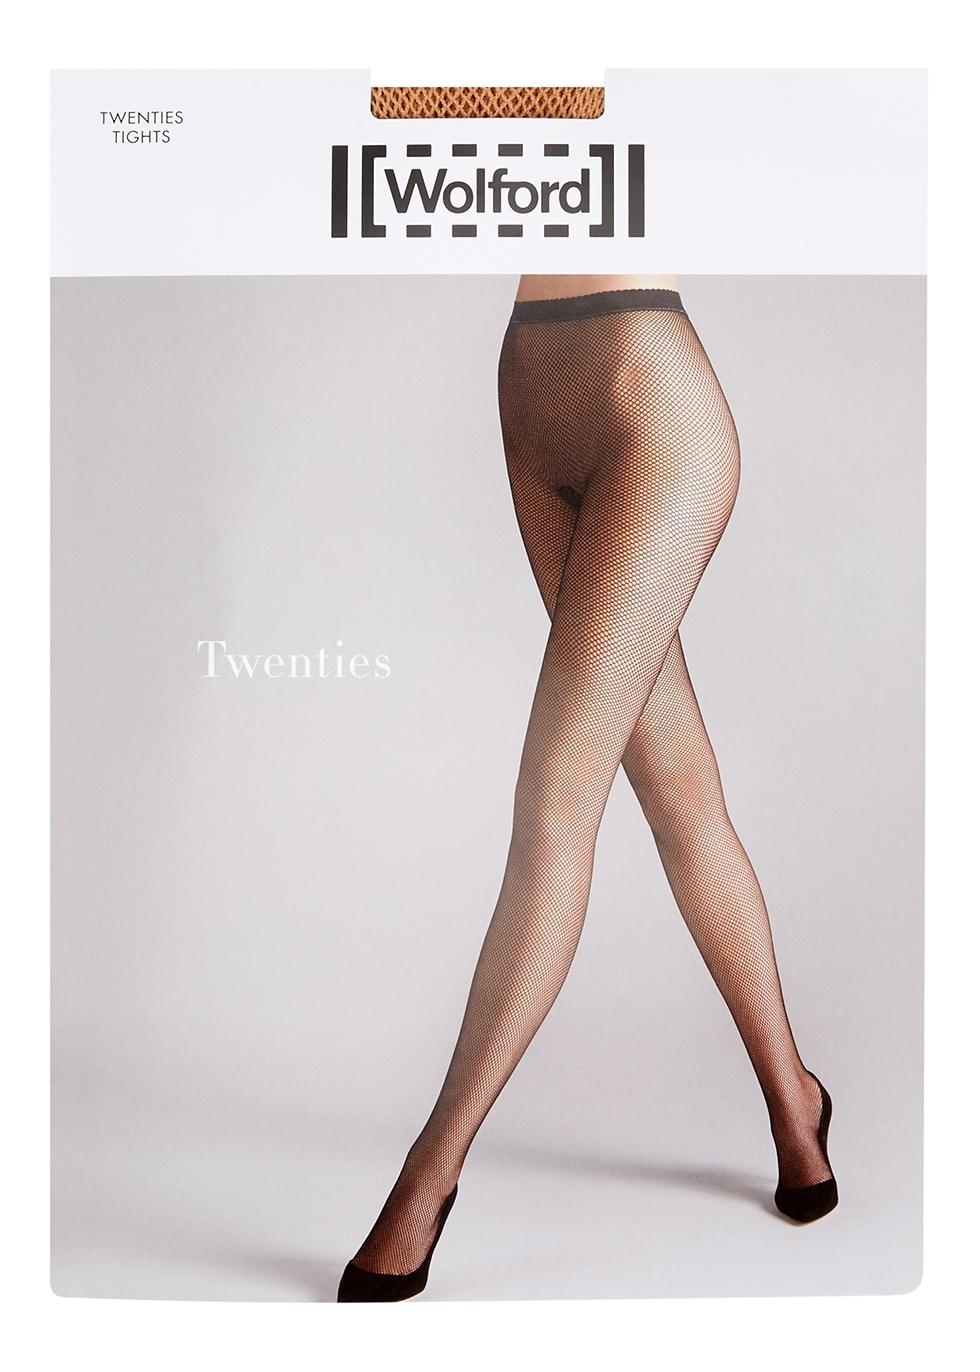 ac0168e64a6 Women s Designer Hosiery - Tights